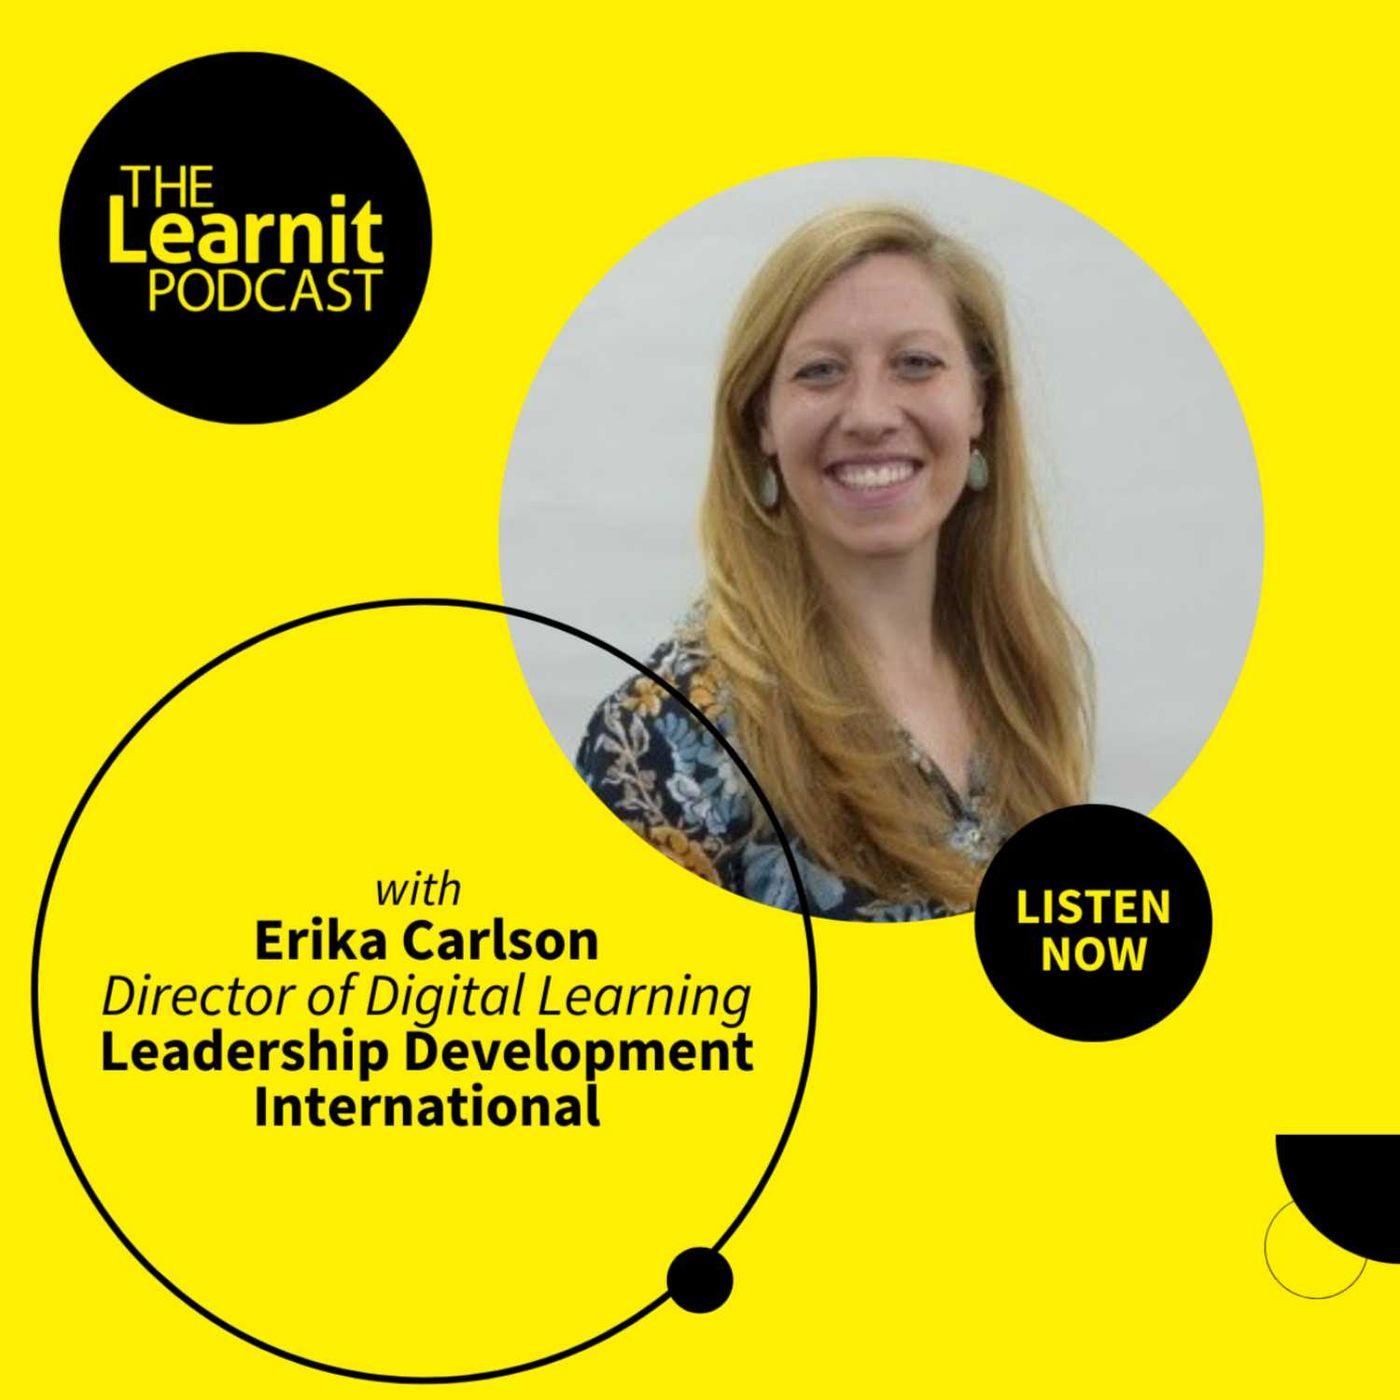 #35, Erika Carlson, Director of Digital Learning, Leadership Development International: Building an Online School in China